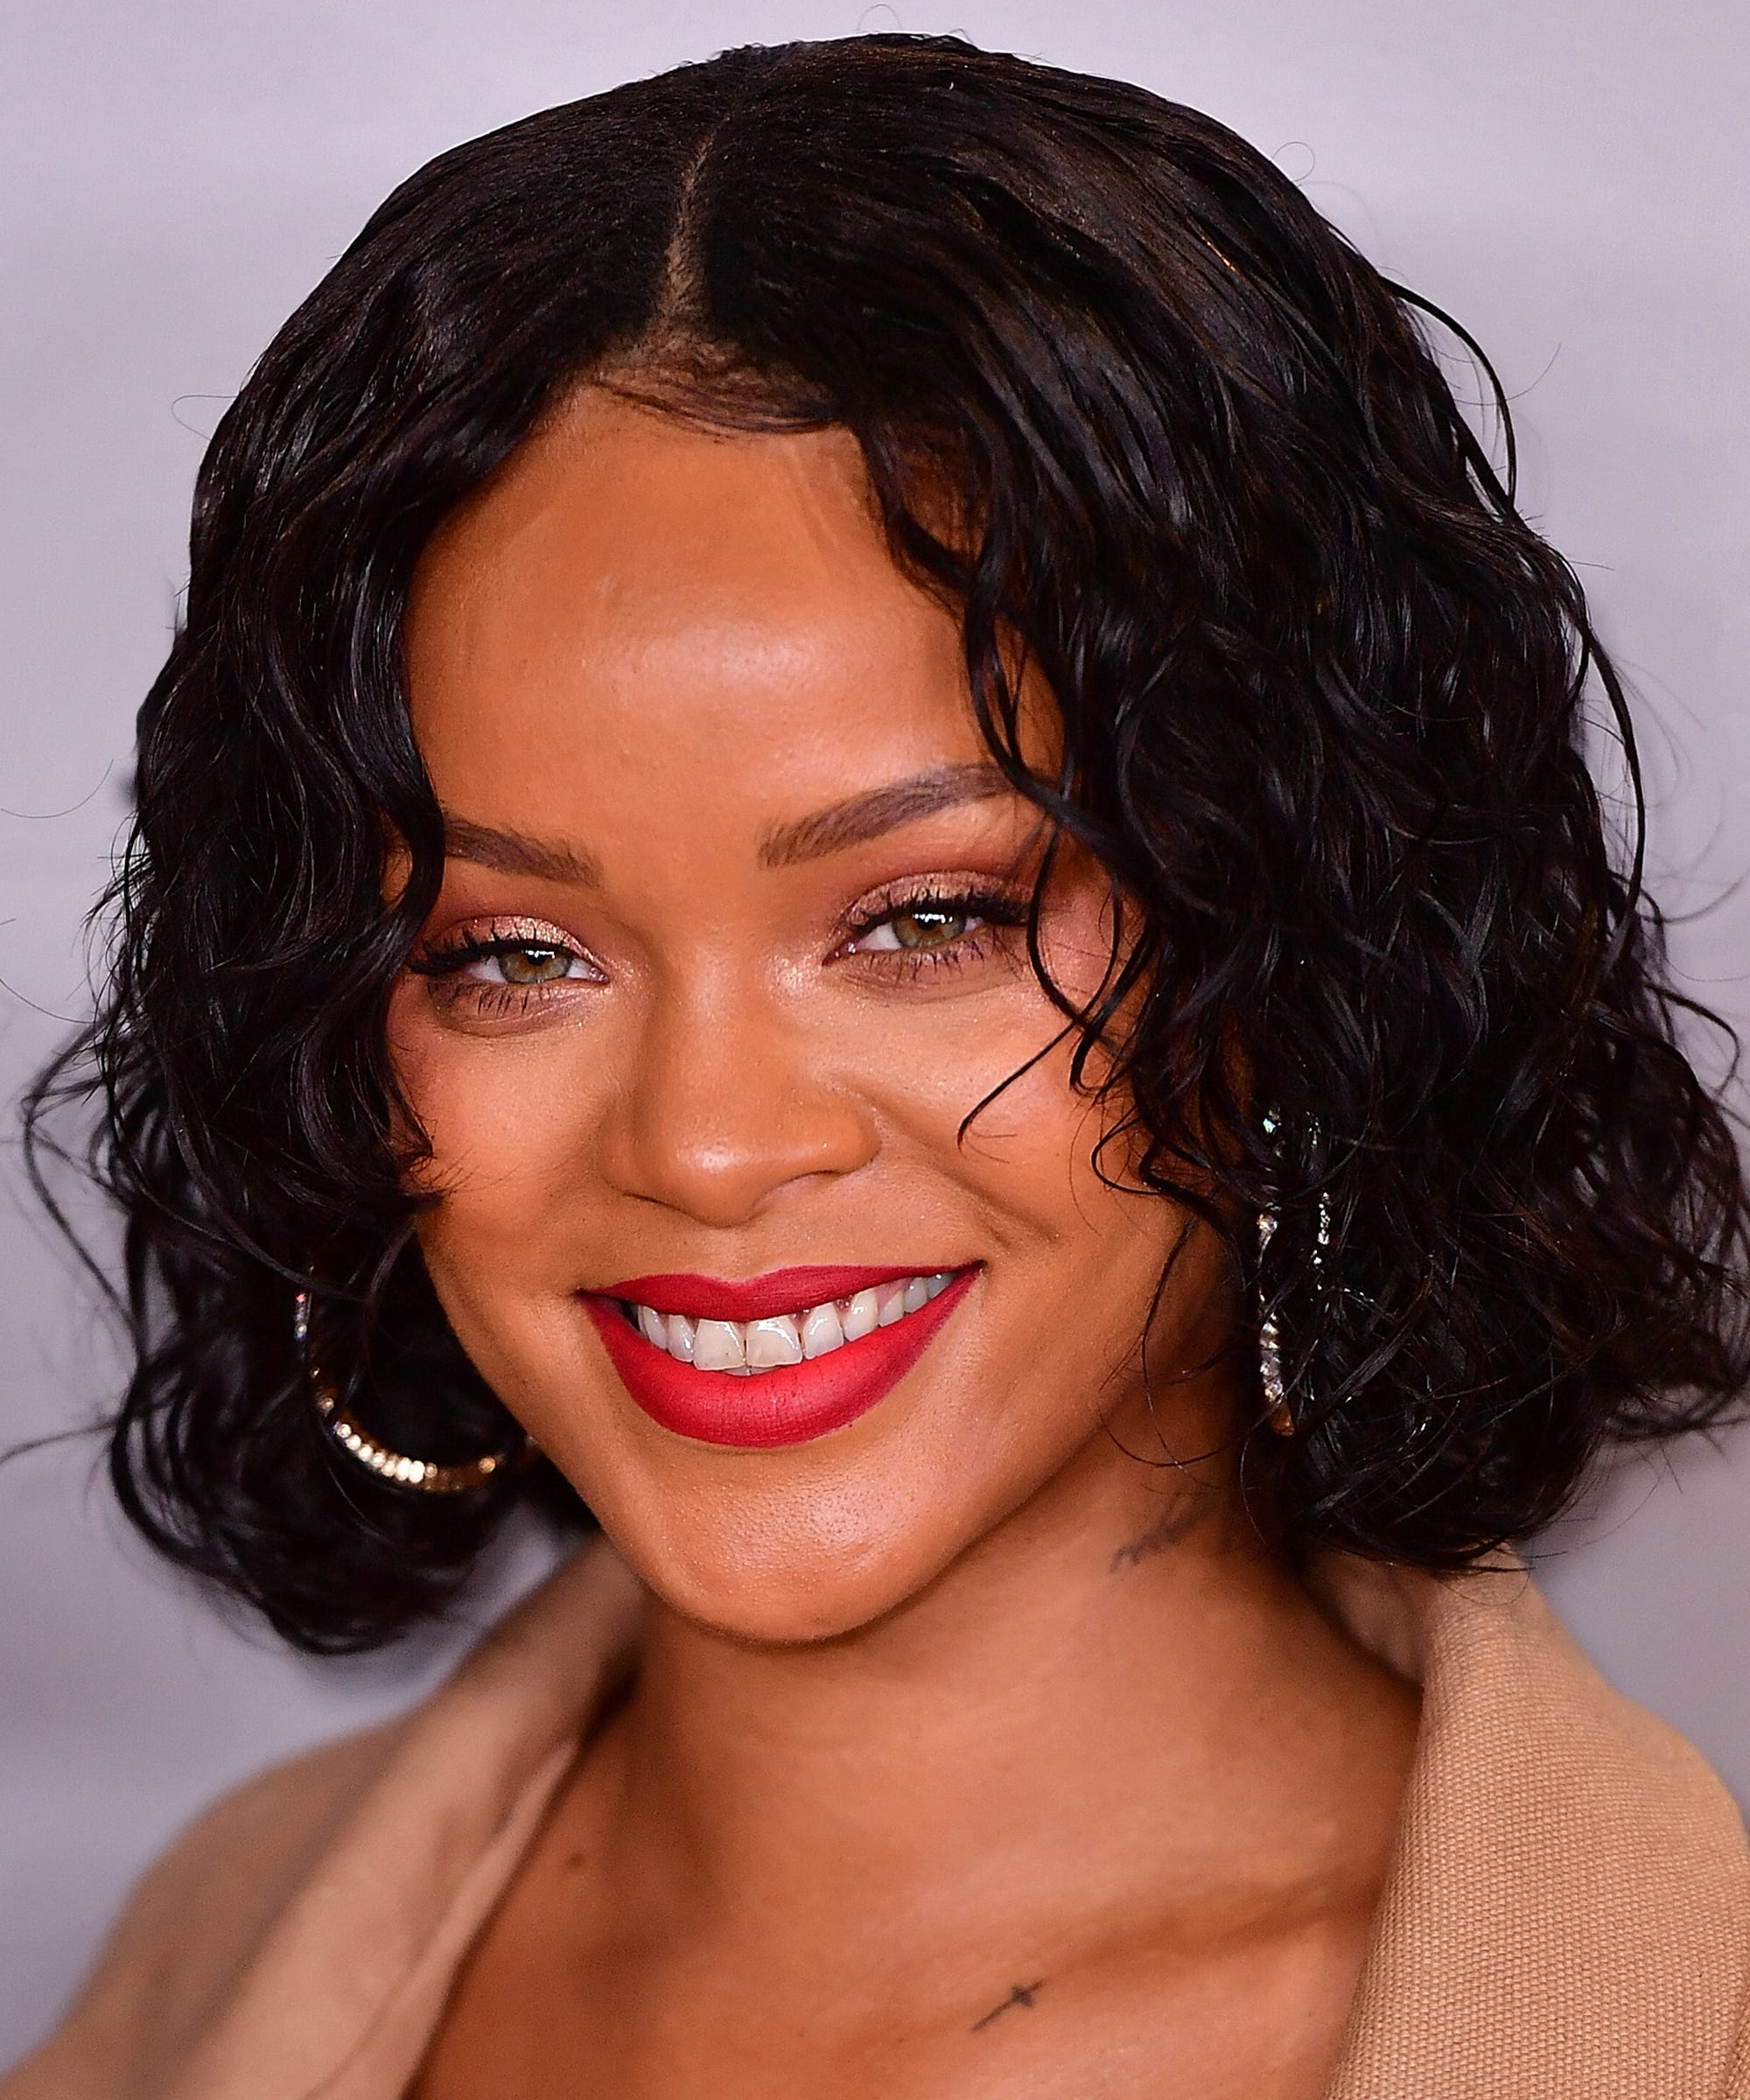 Rihanna - News, Photos, Latest Music, Interviews